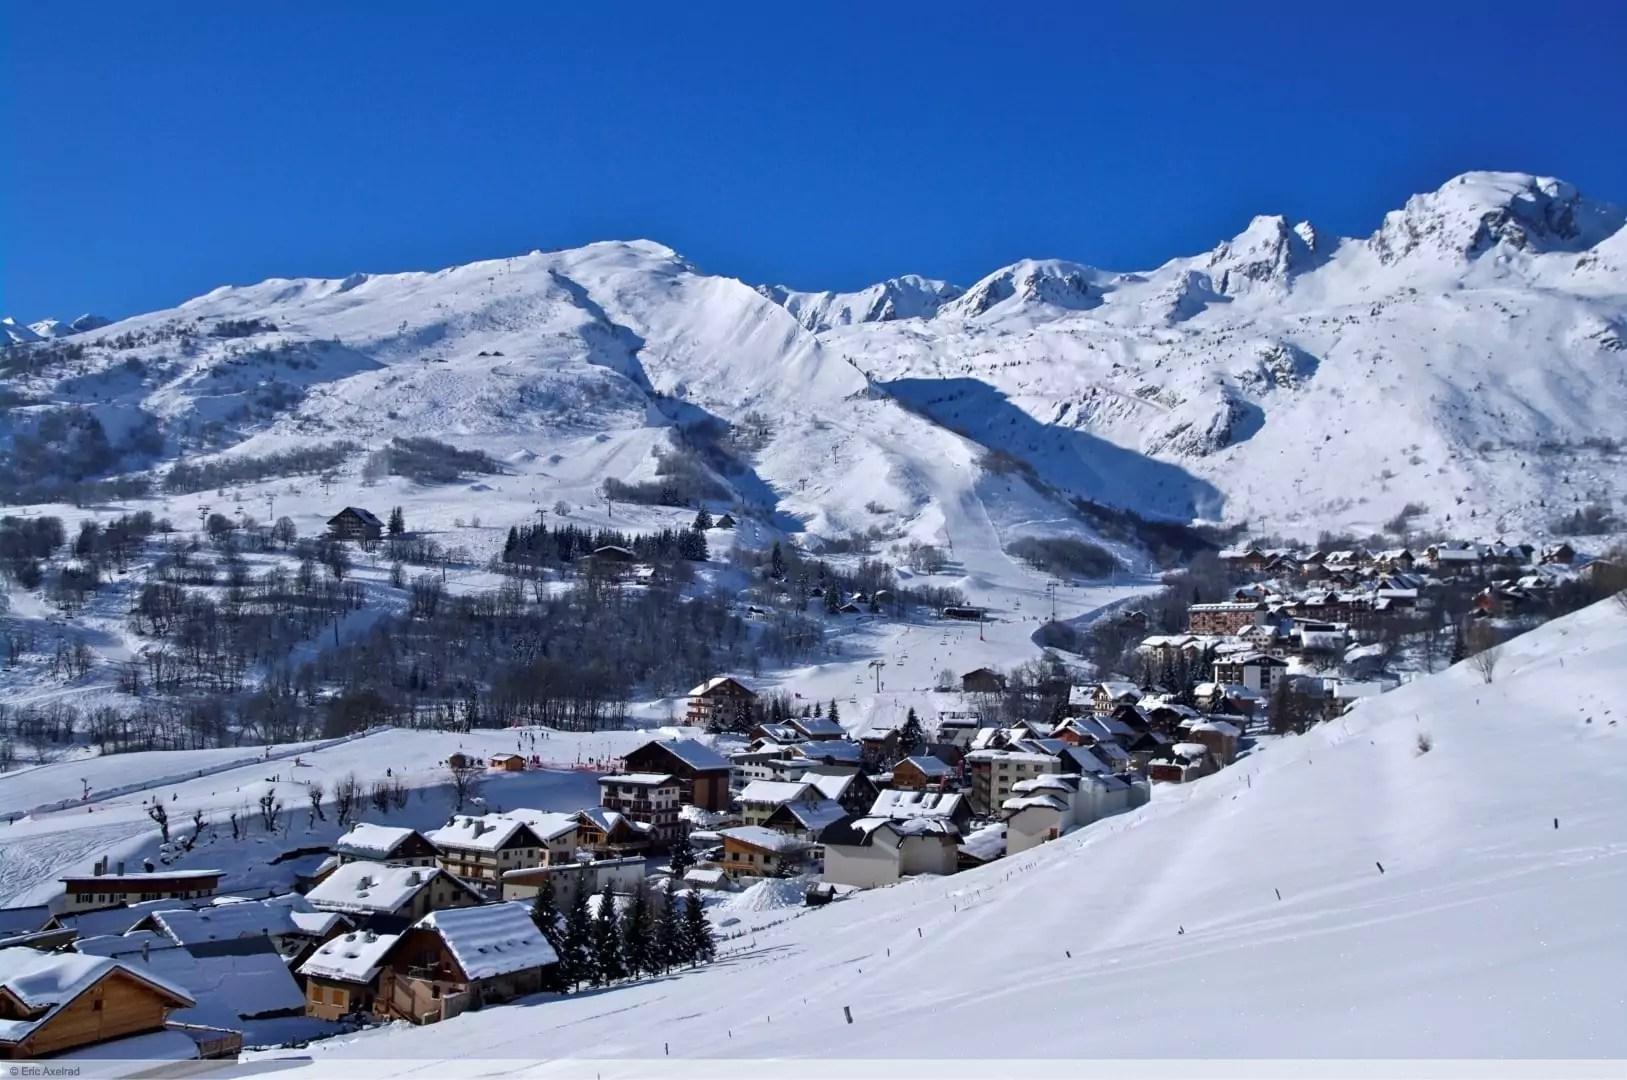 wintersport en aanbiedingen in Saint Sorlin (Les Sybelles)